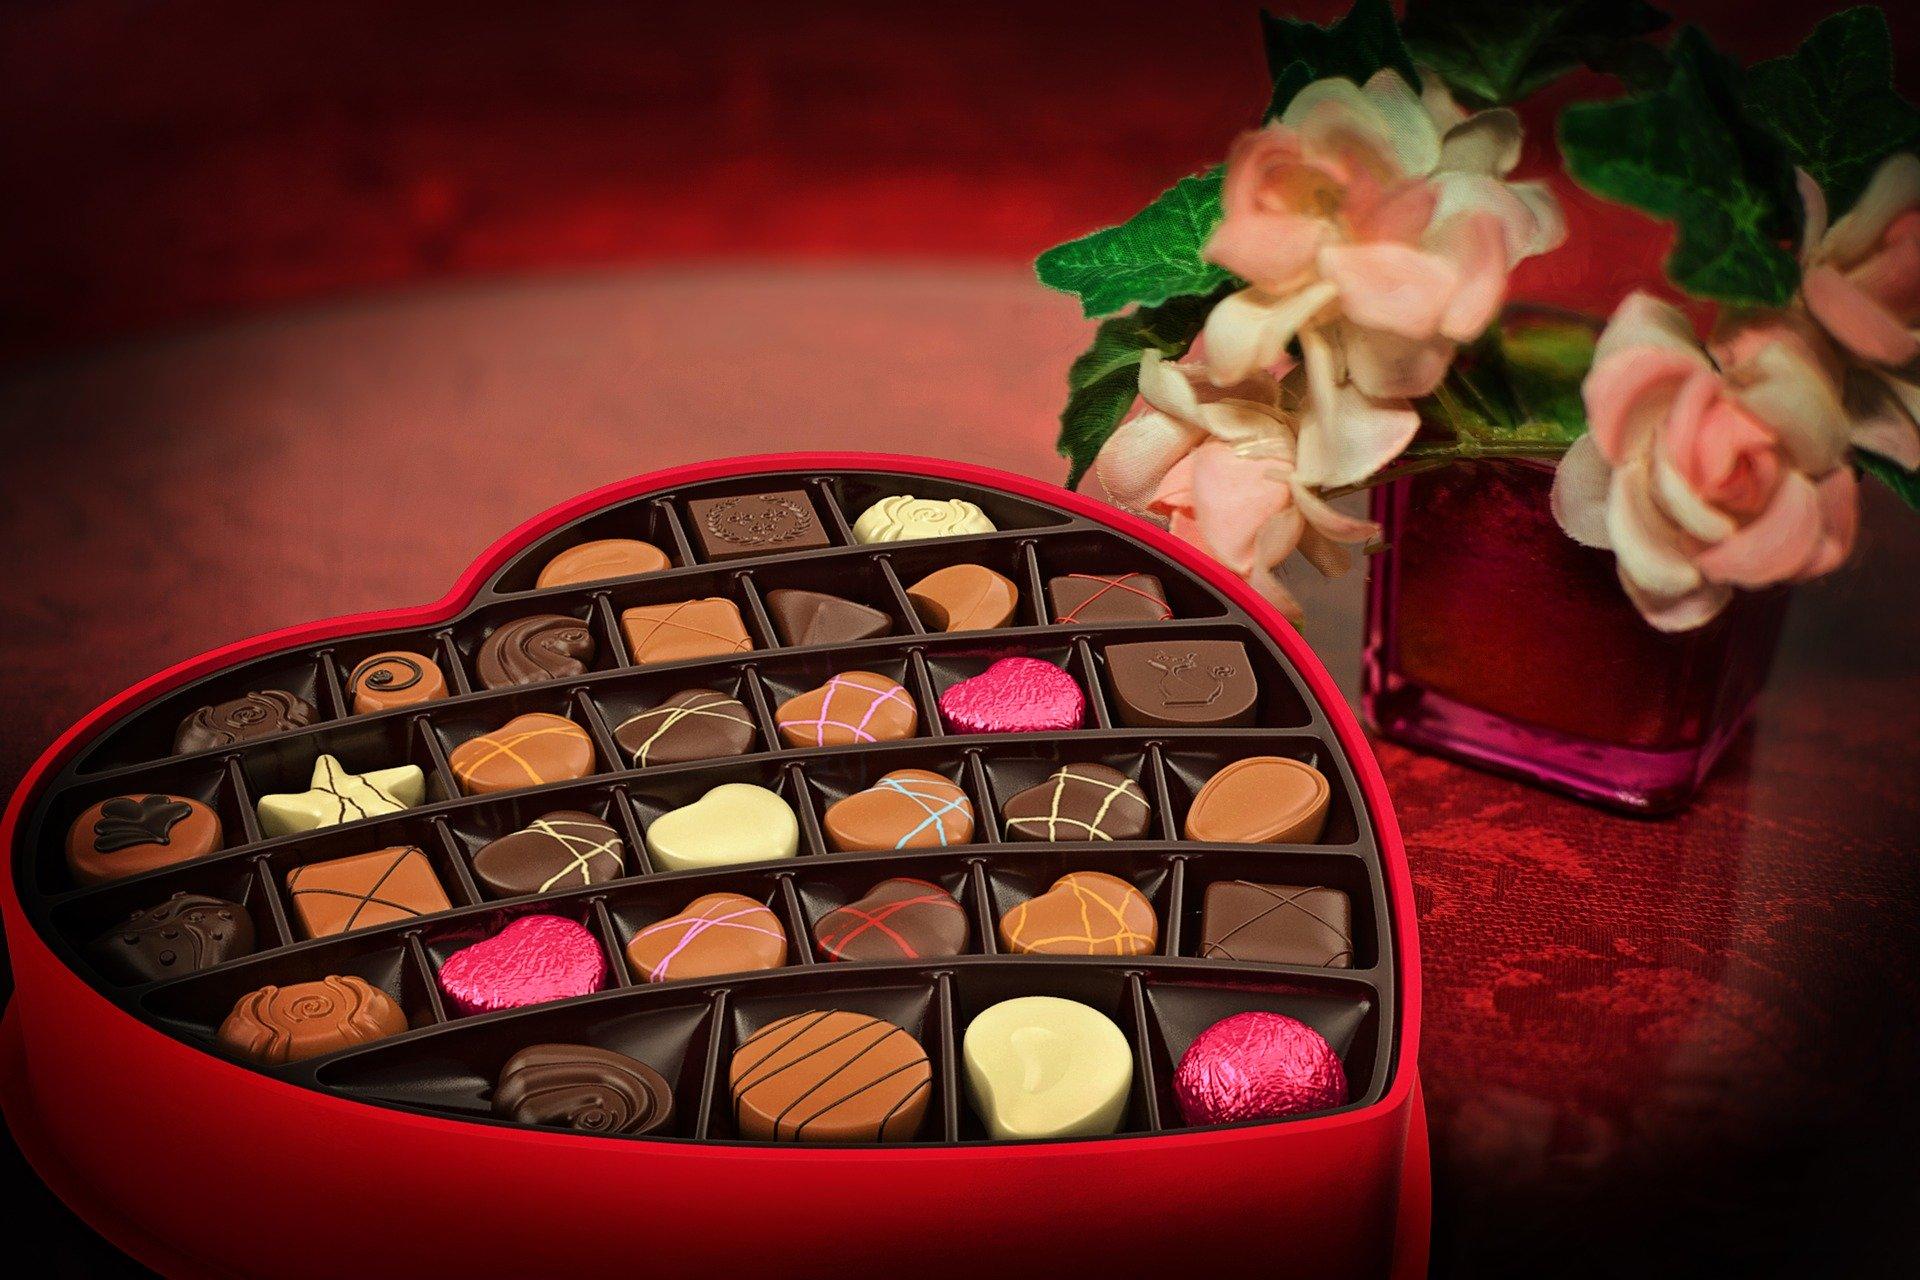 https://cdn.entertainmentdaily.com/2020/02/13104727/valentines-day-2057745_1920.jpg